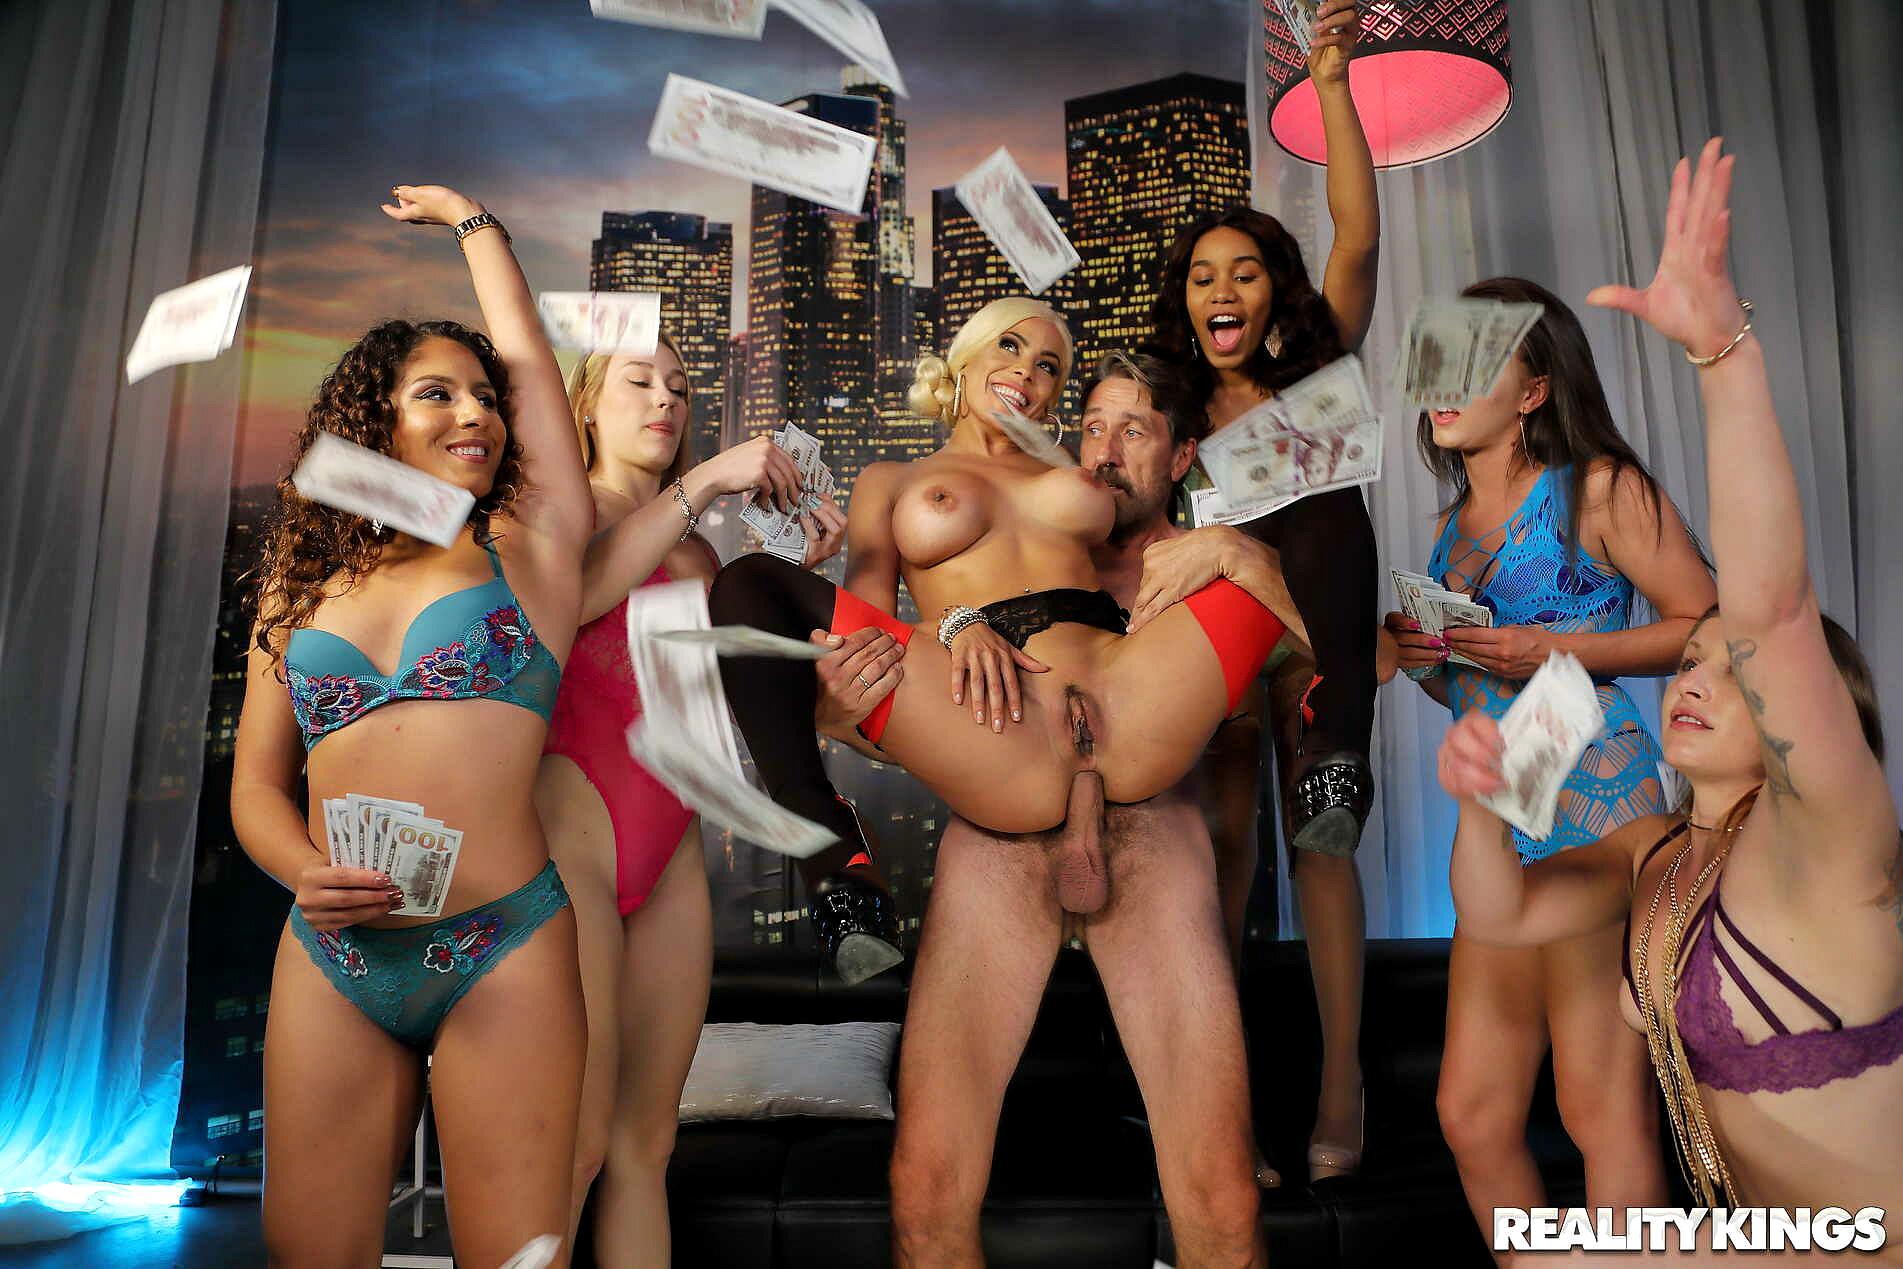 super hot naked girls free